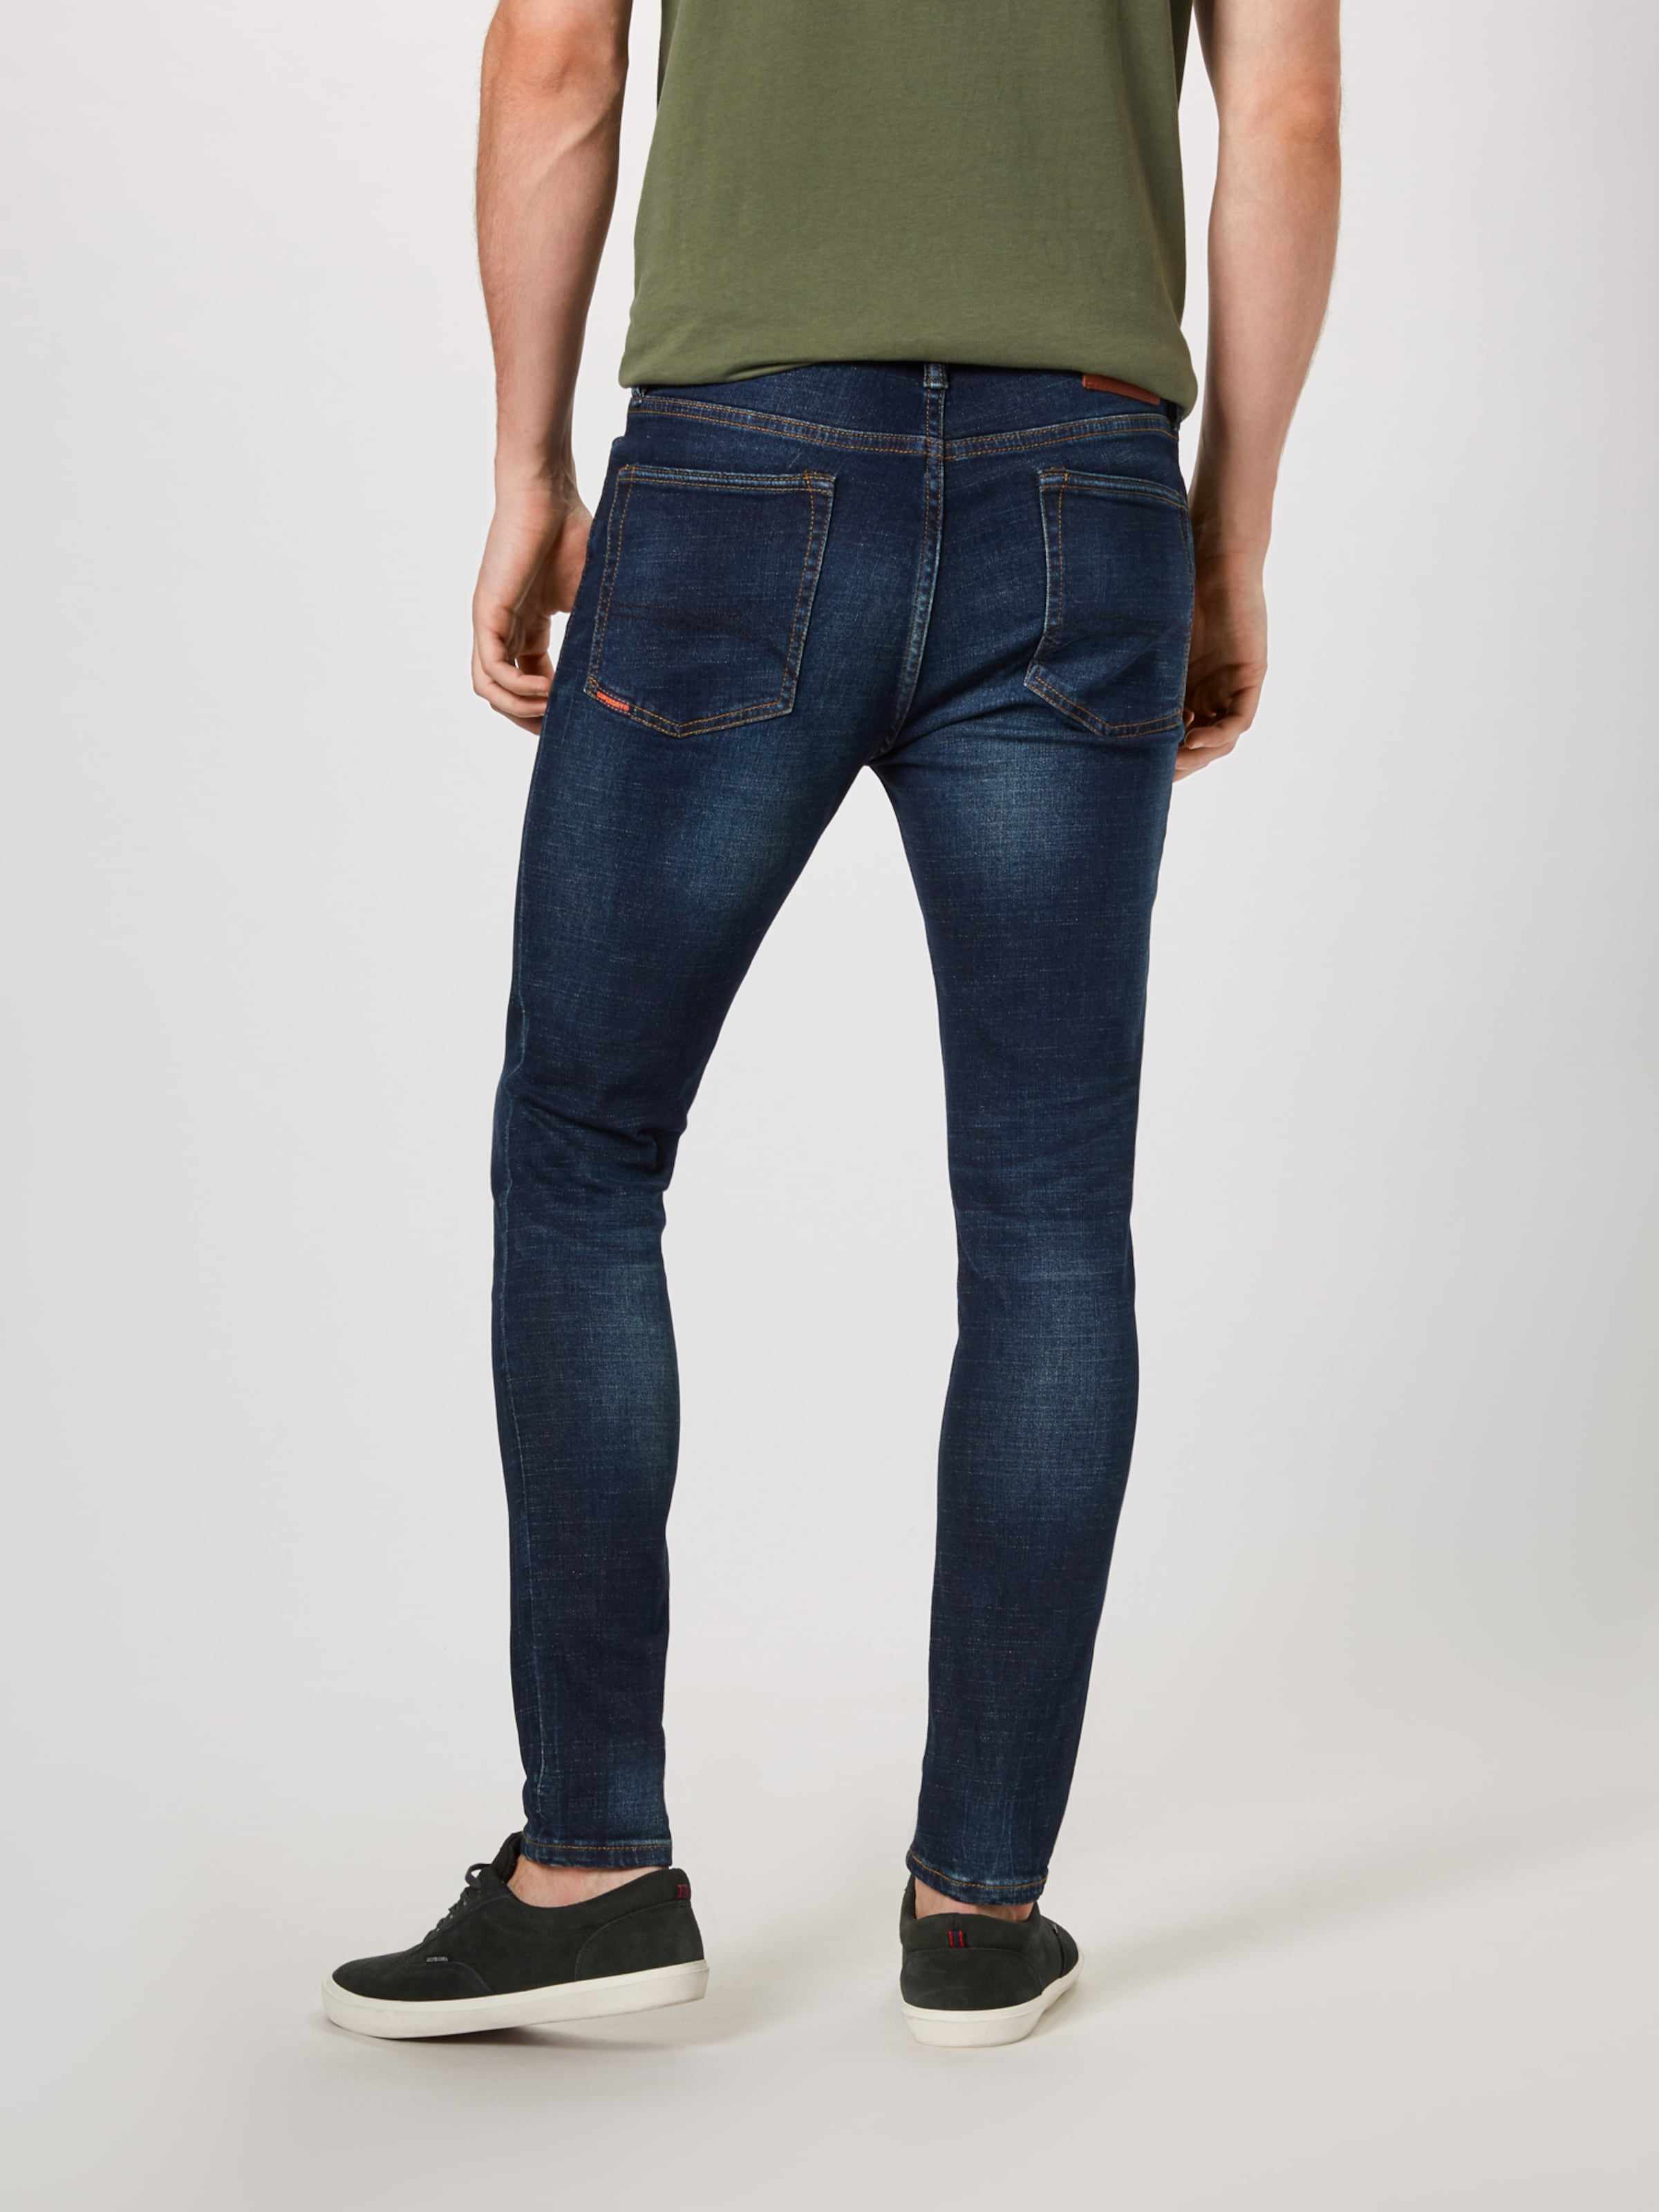 'travis In Denim Blue Superdry Skinny' Jeans E2bW9YeDHI